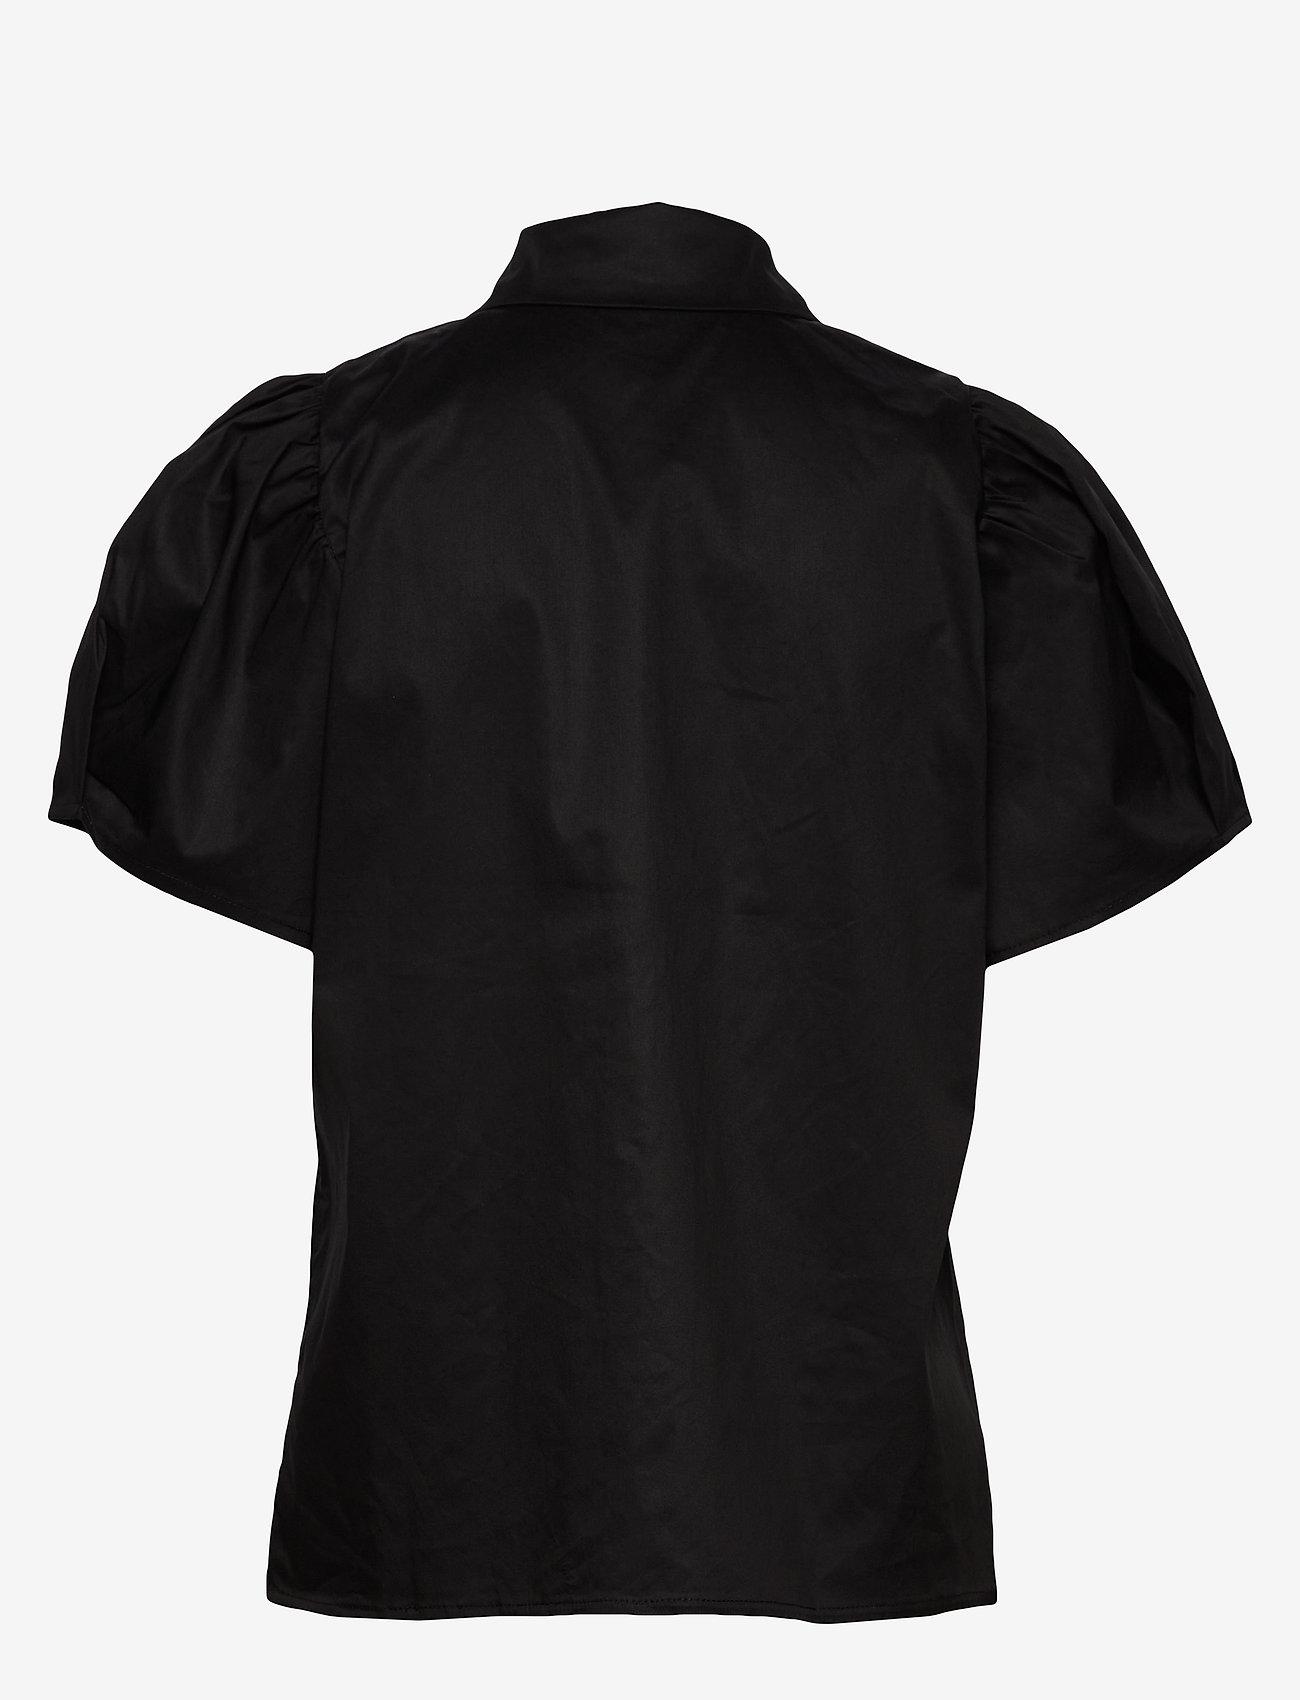 Minus - Elaisa shirt - koszule z krótkim rękawem - sort - 1